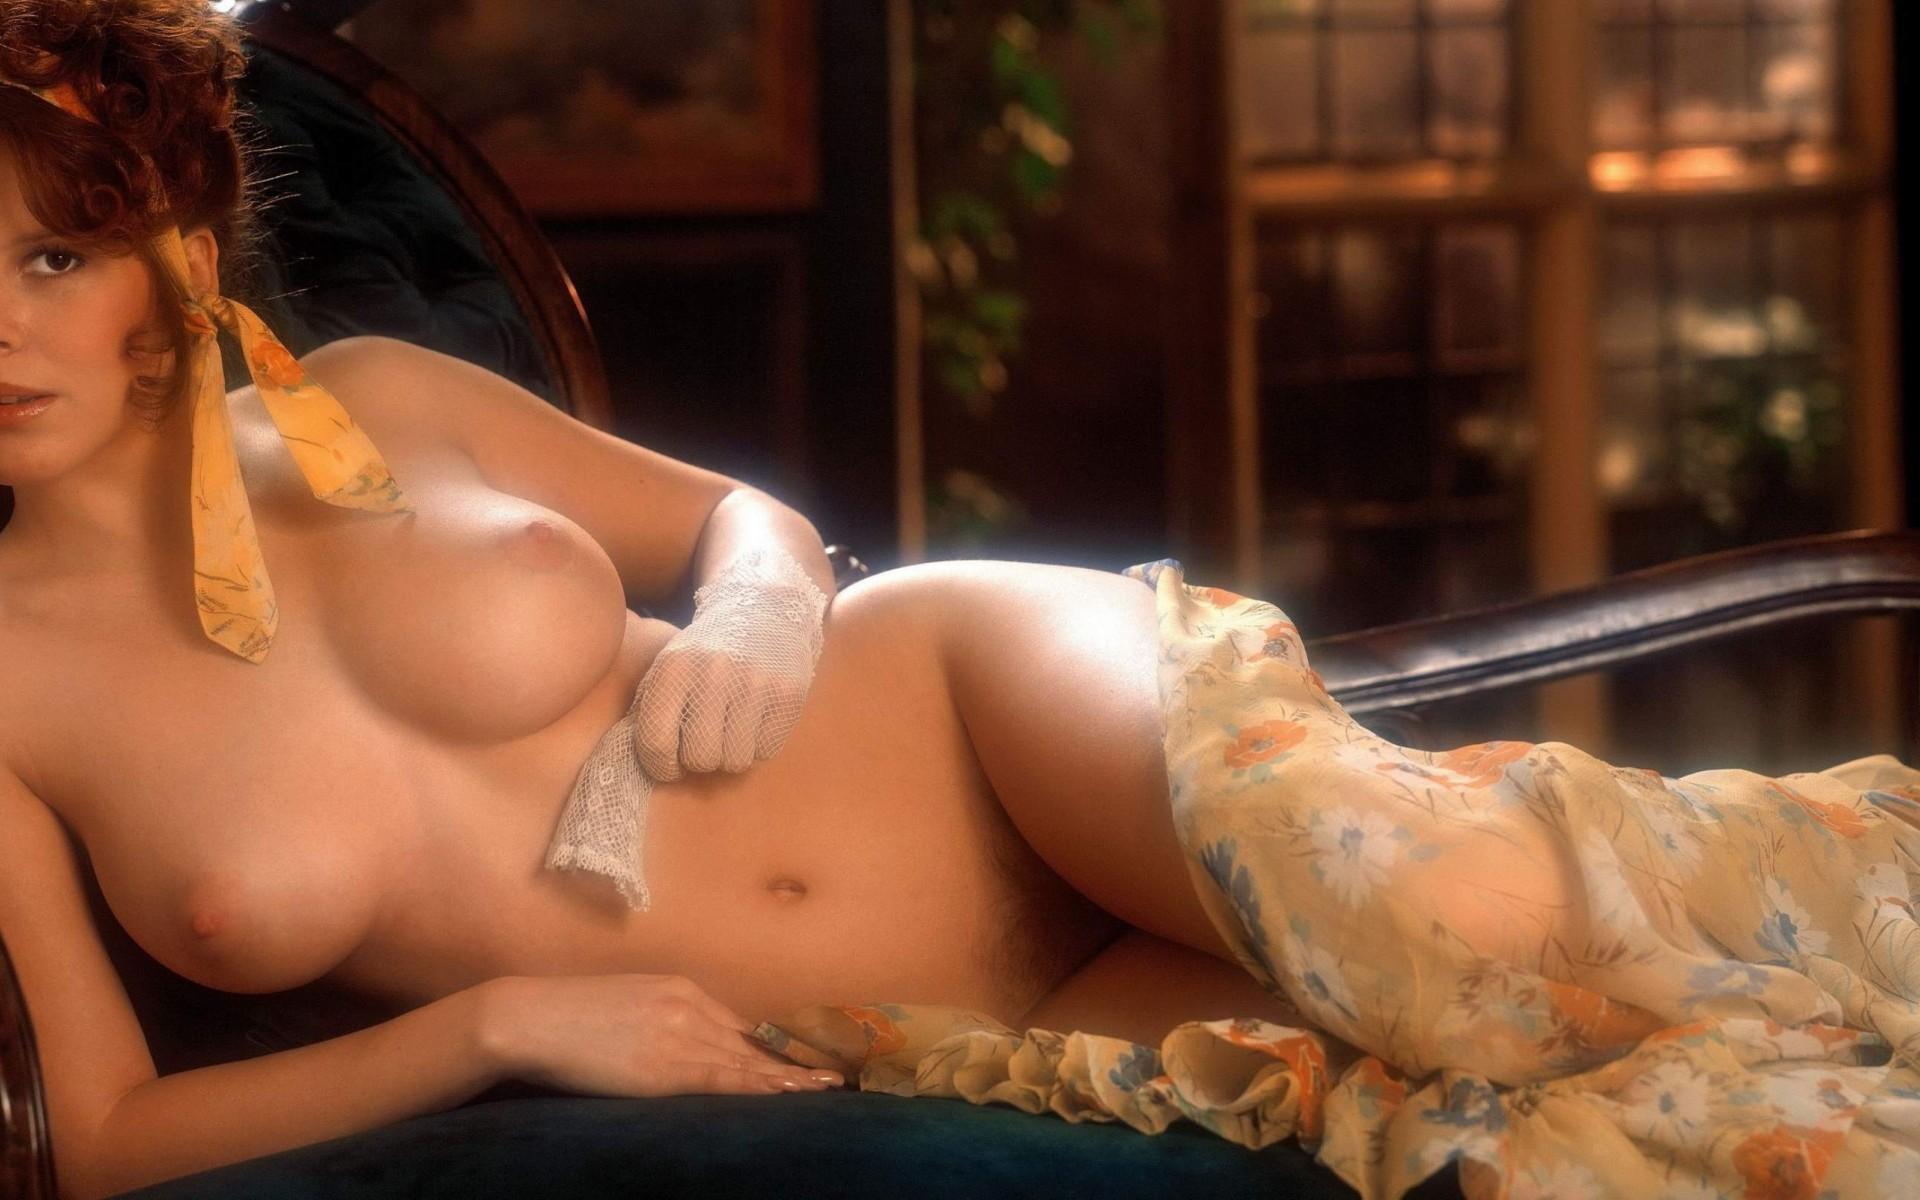 Ретро эротические актрисы, 25 порно звезд на пенсии (70 фото) 11 фотография